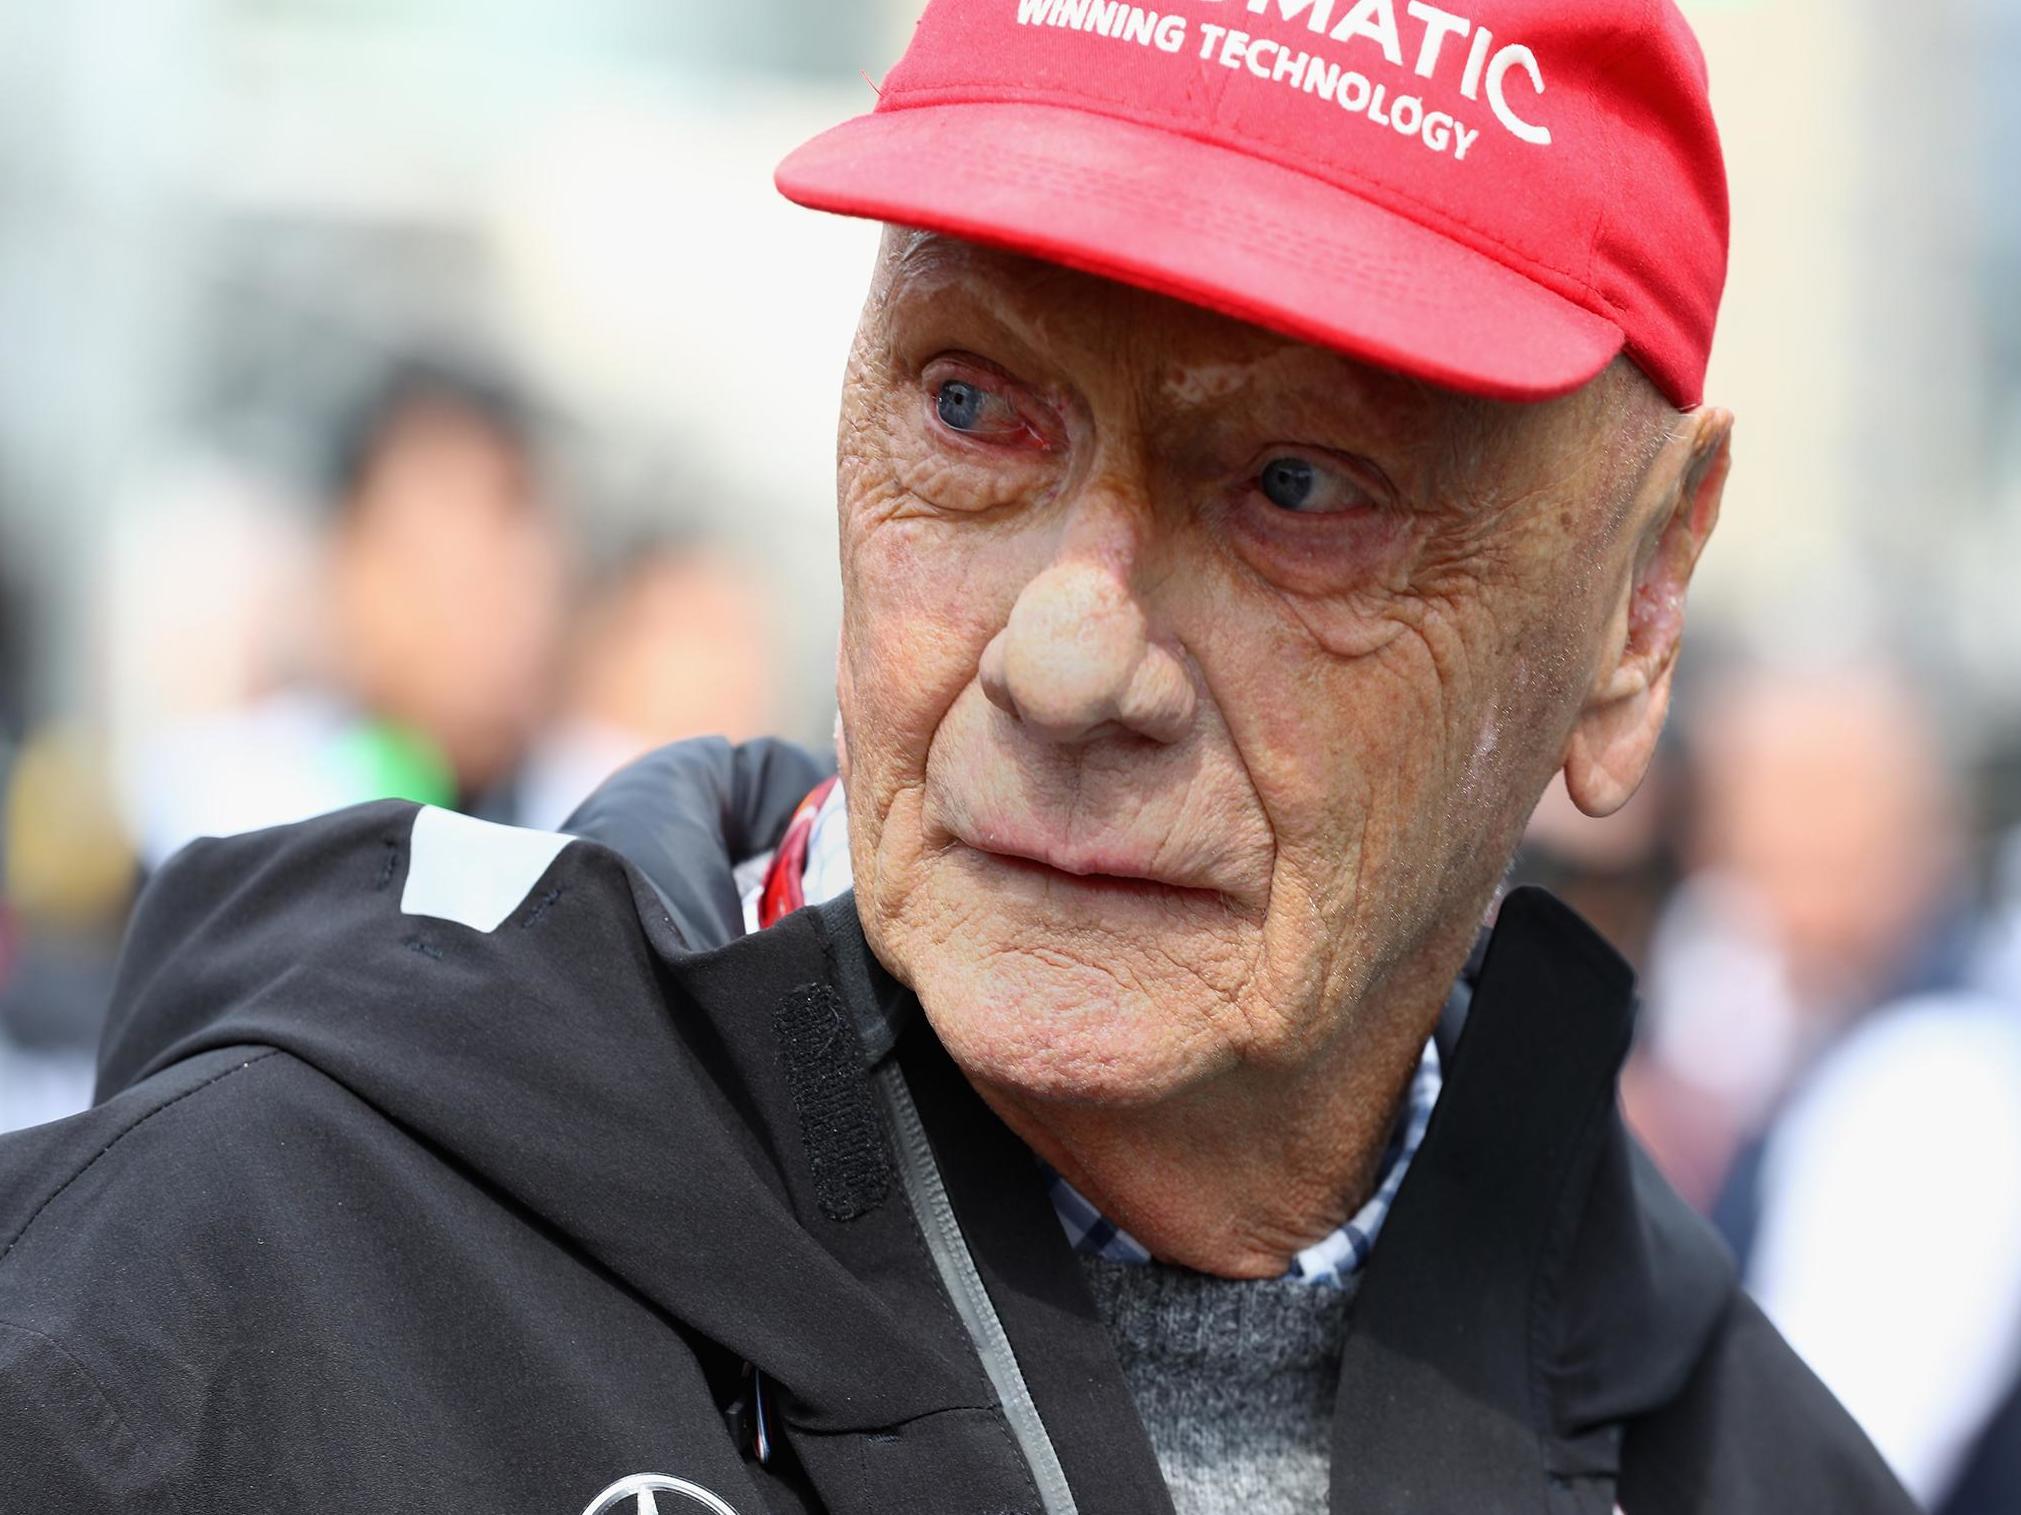 Niki Lauda daniel bruhl